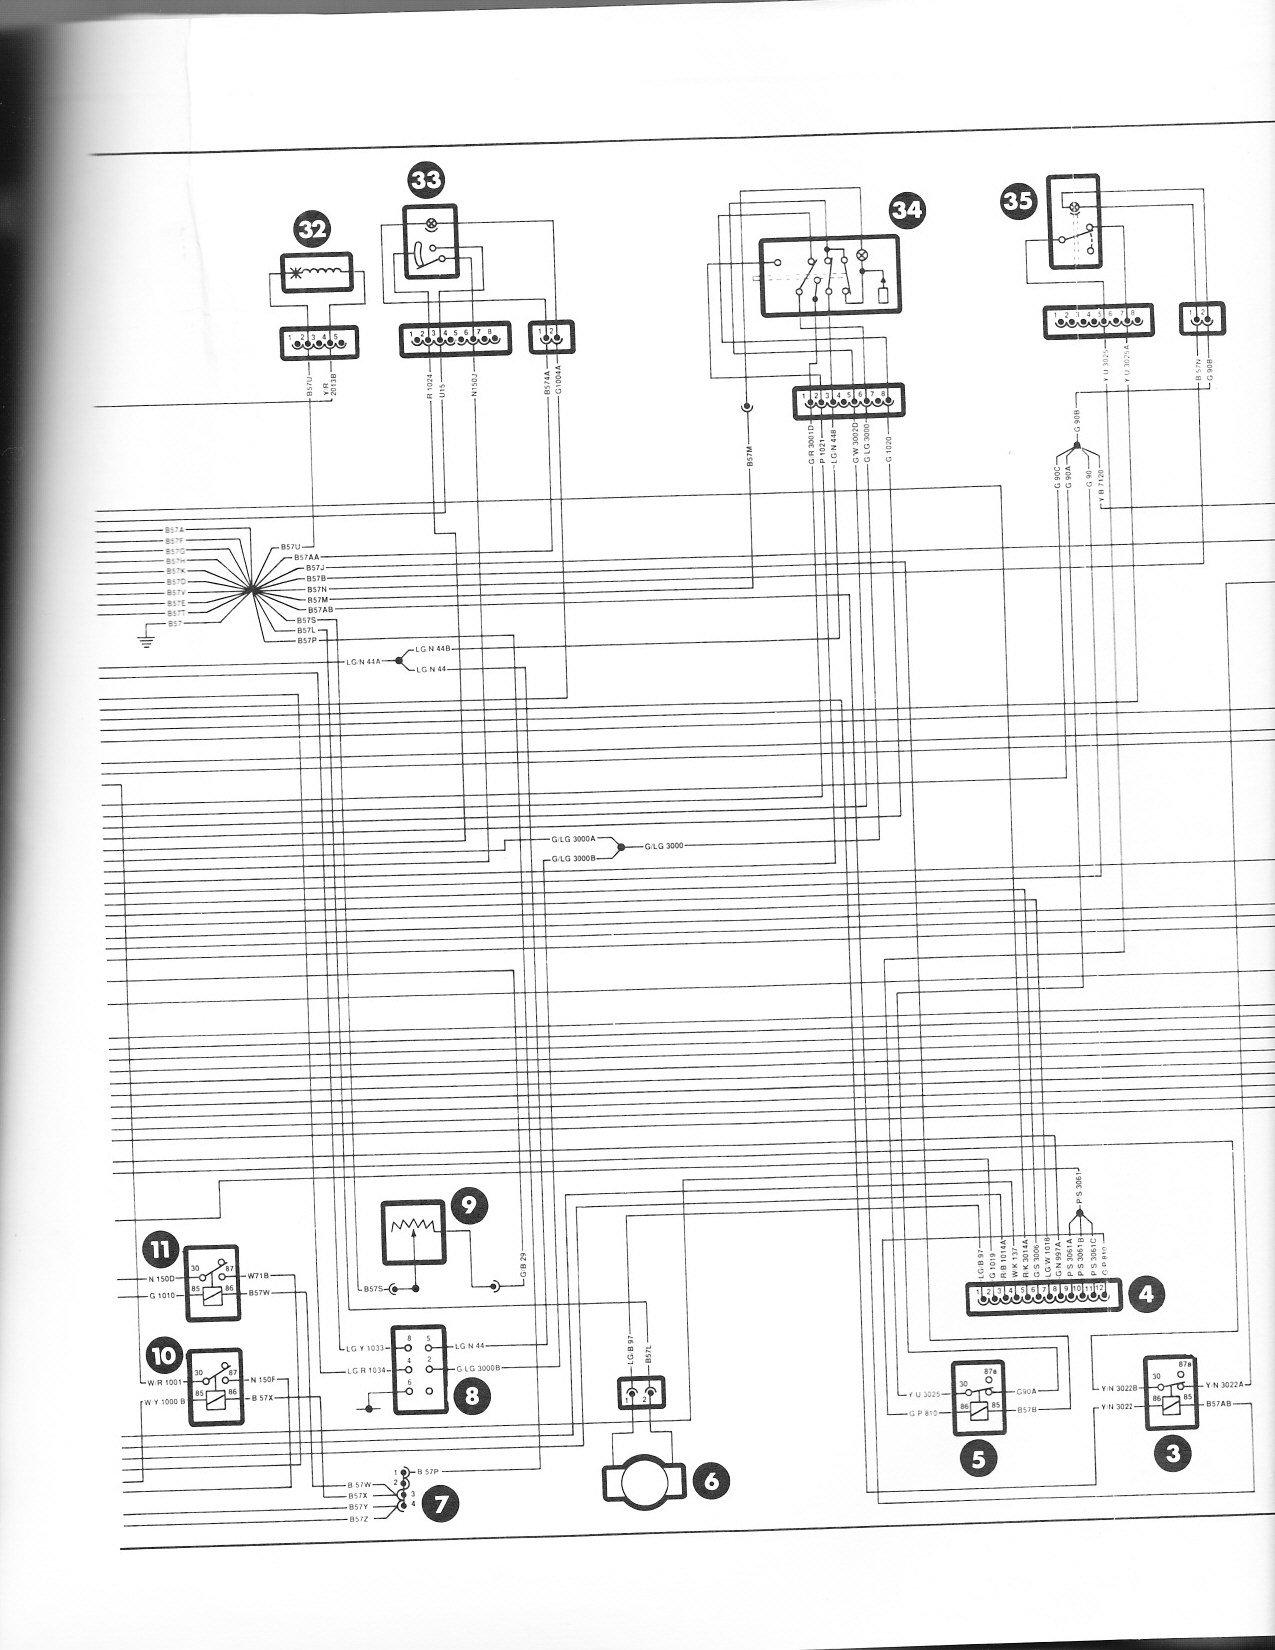 Ford New Holland 3930 Wiring Diagram - 350 Marine Engine Starter Wiring  Diagram for Wiring Diagram SchematicsWiring Diagram Schematics